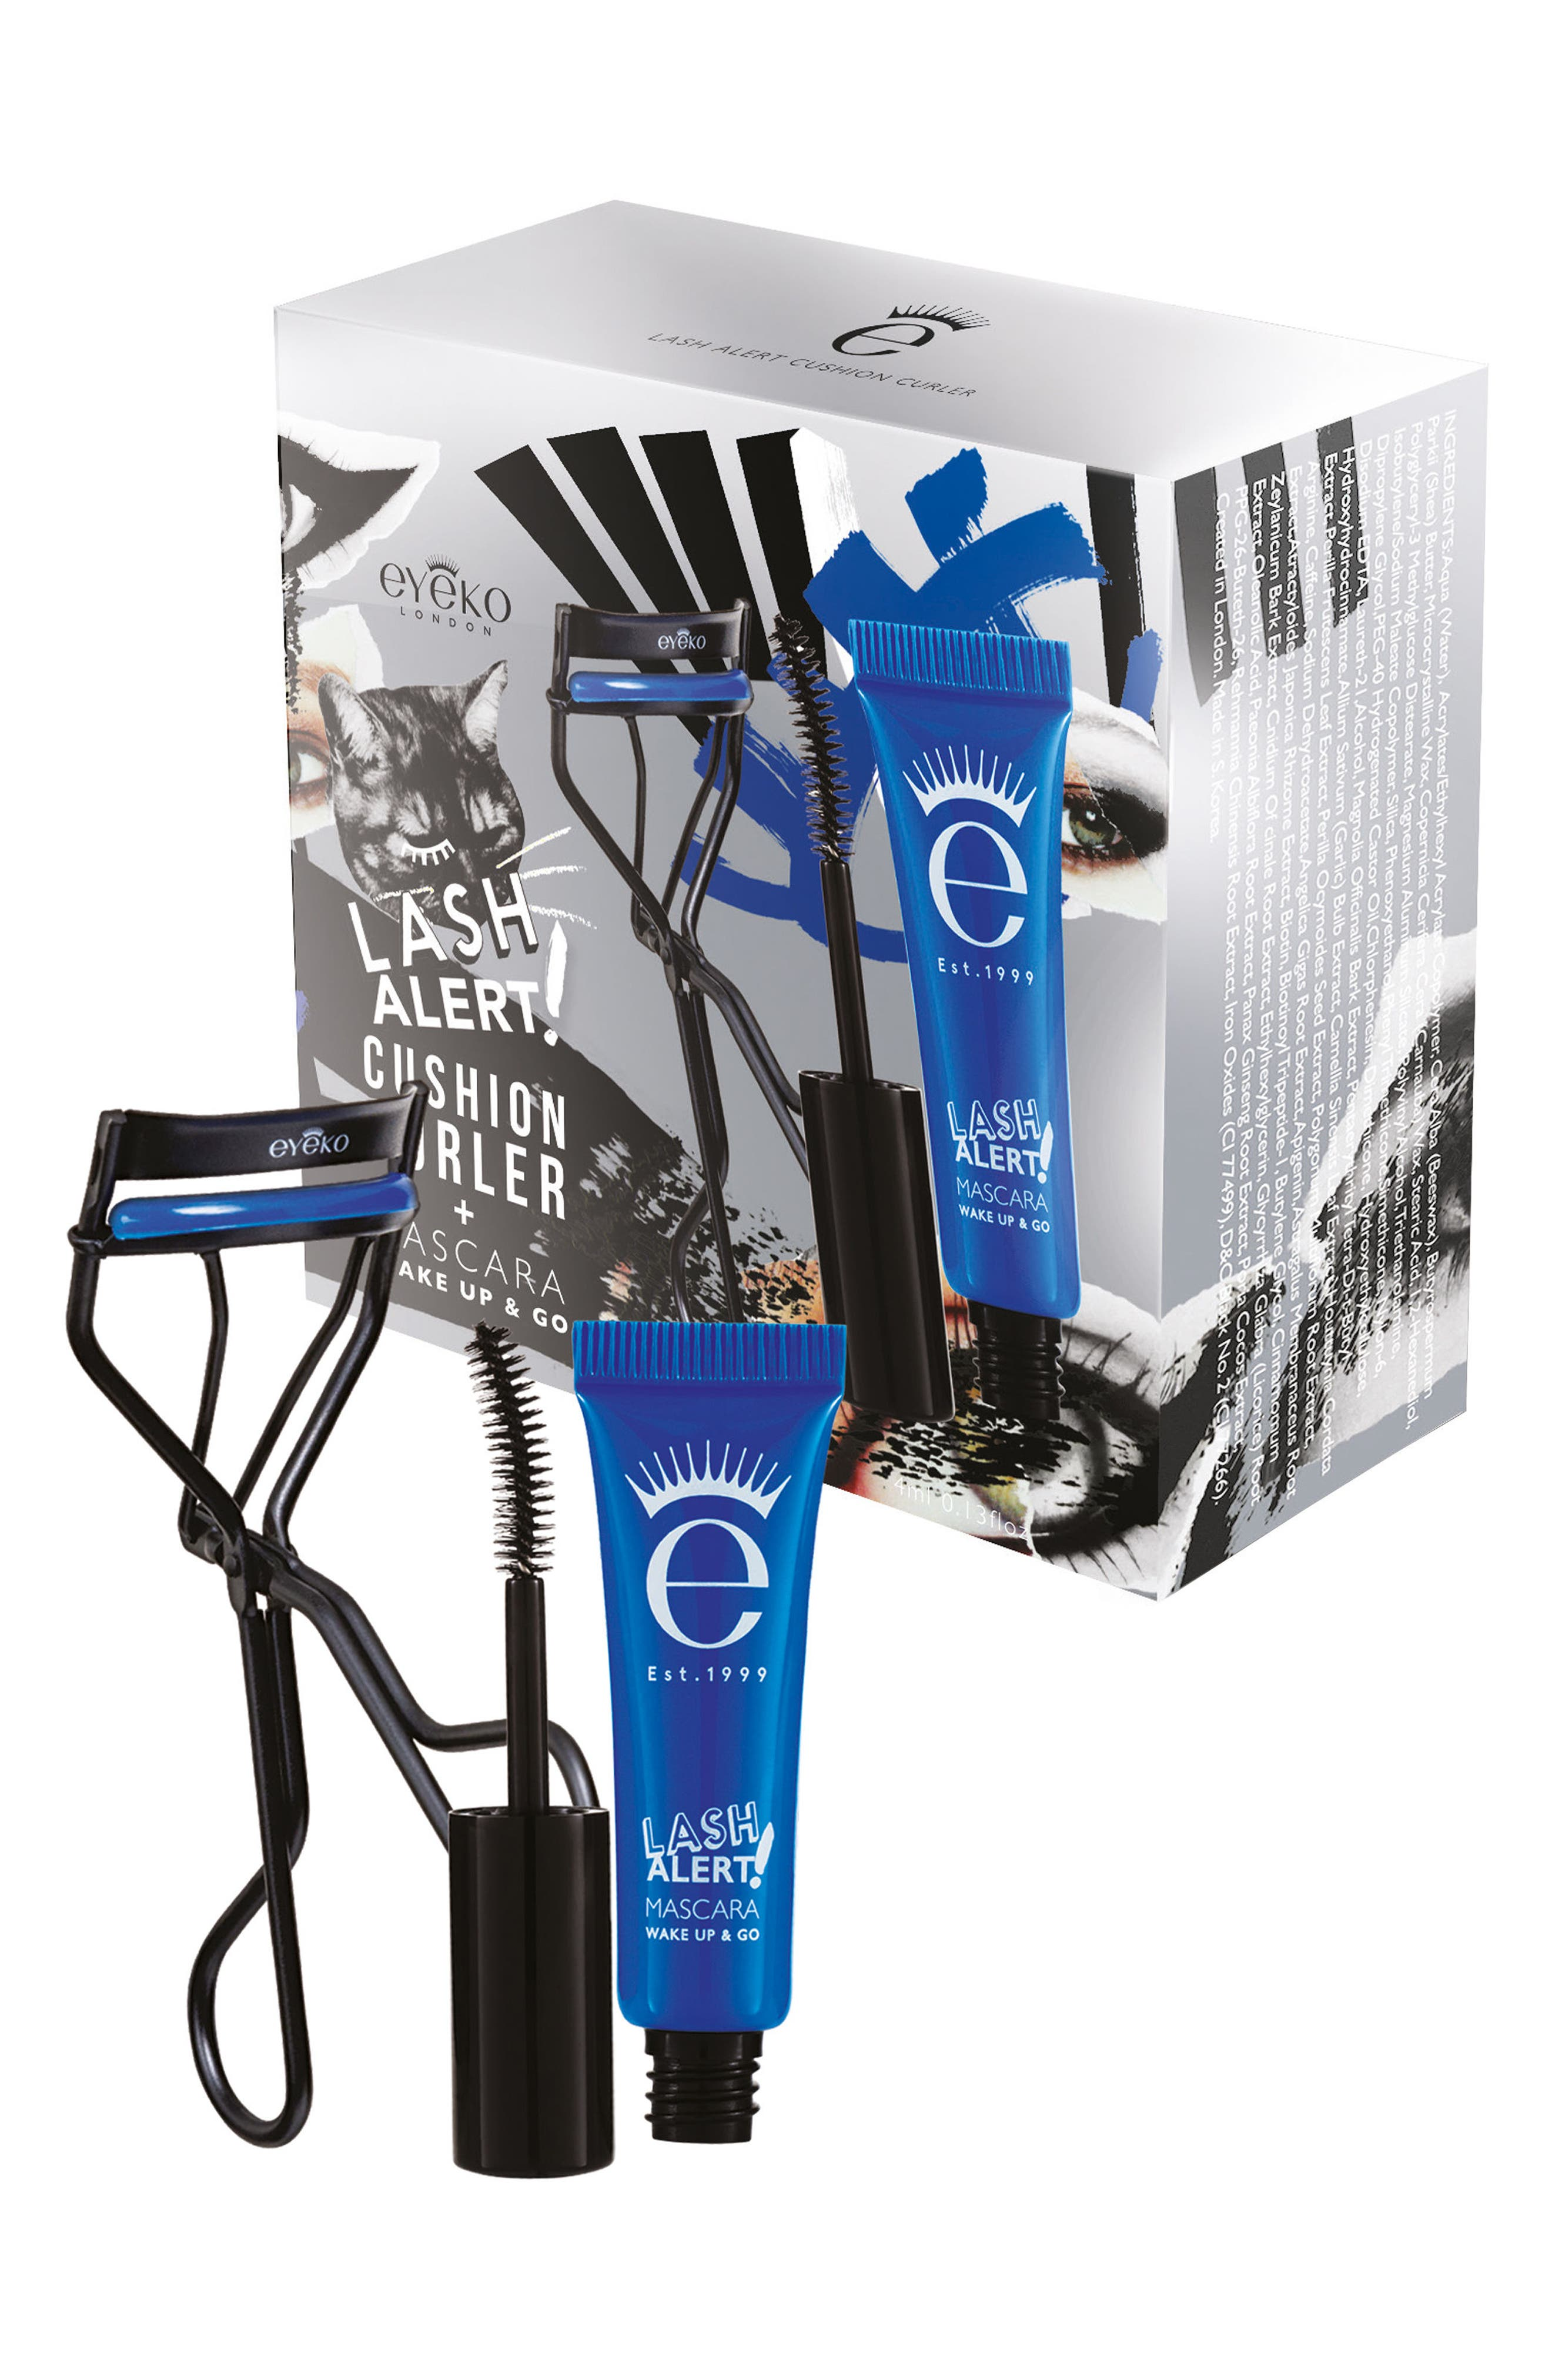 Eyeko Lash Alert Mascara & Cushion Curler Set